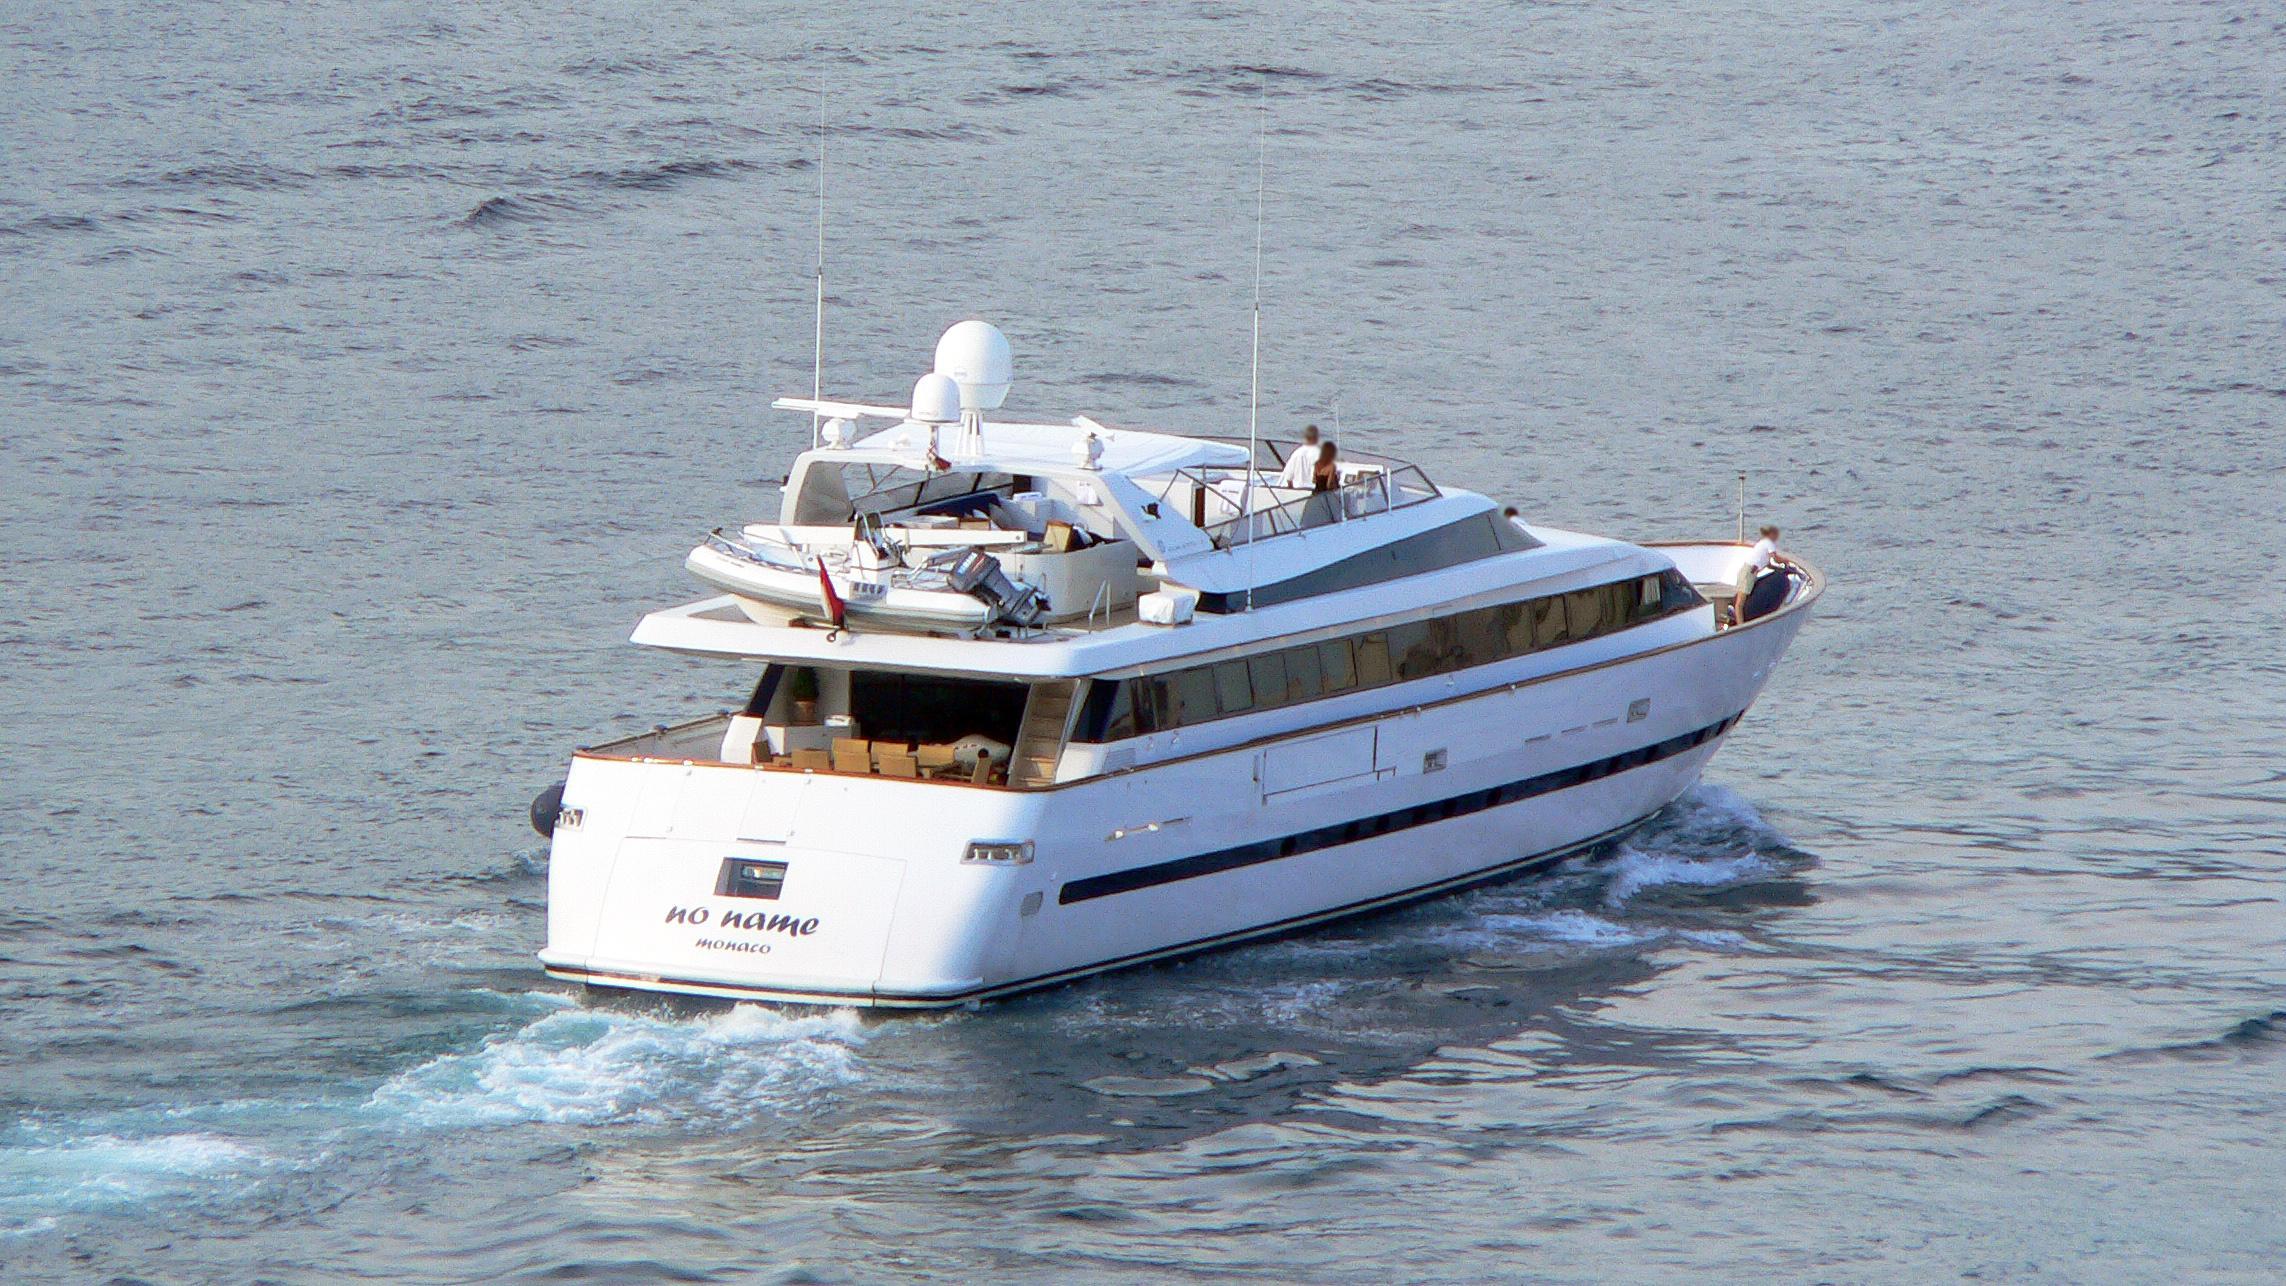 no-name-motor-yacht-baglietto-1993-33m-cruising-stern